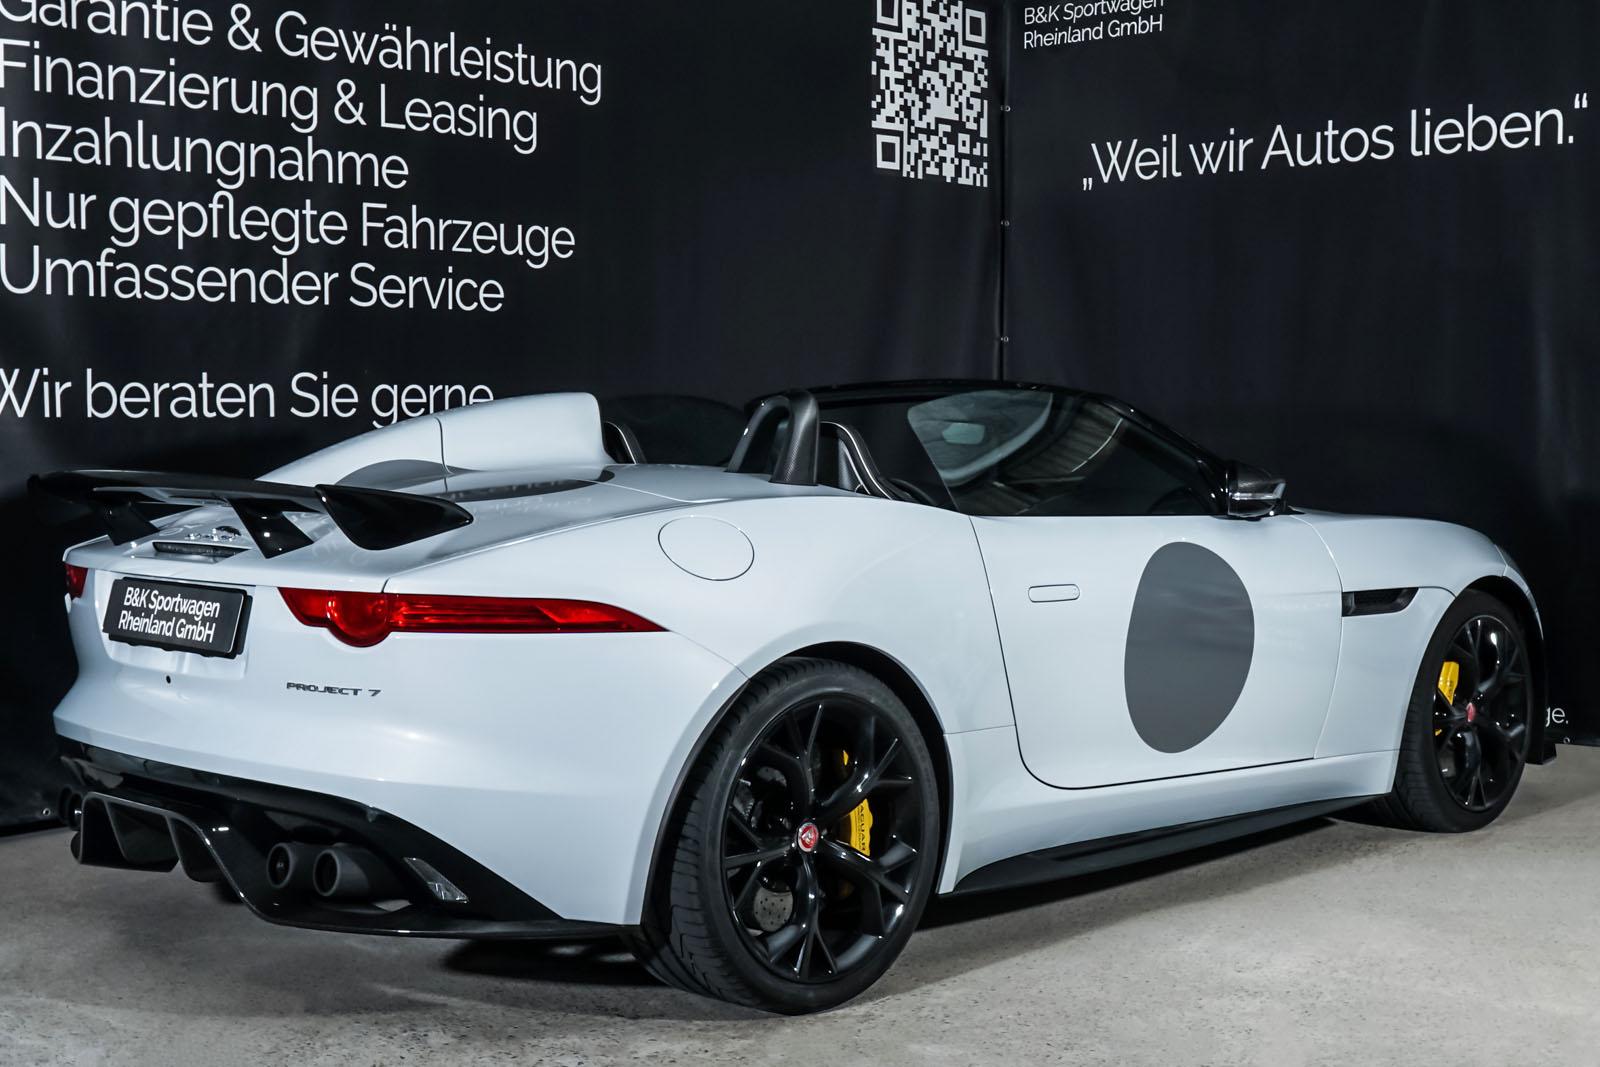 Jaguar_Project7_Weiss_Schwarz_JAG-0829_30_w